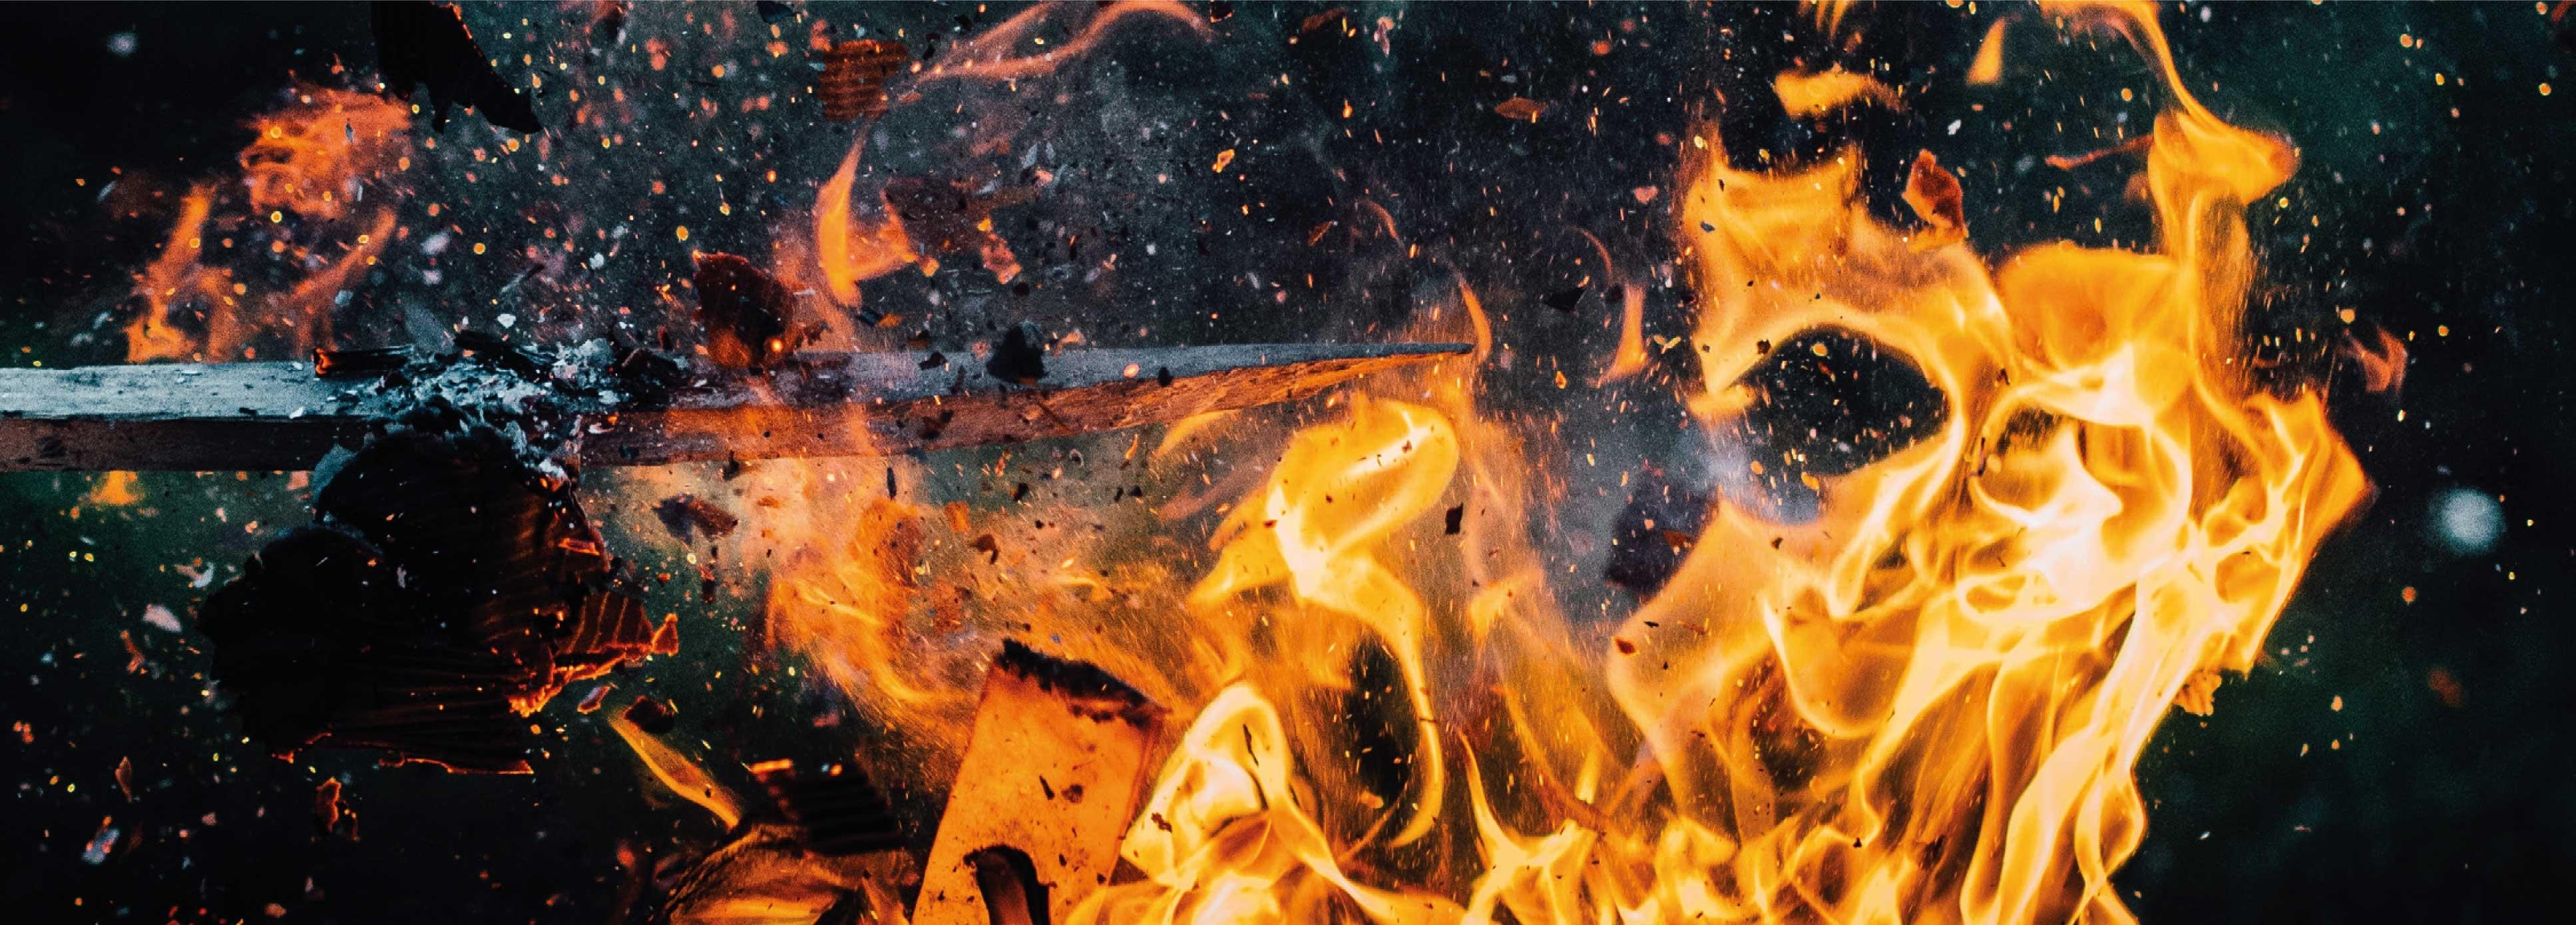 Productieproces Kirkpatrick oven